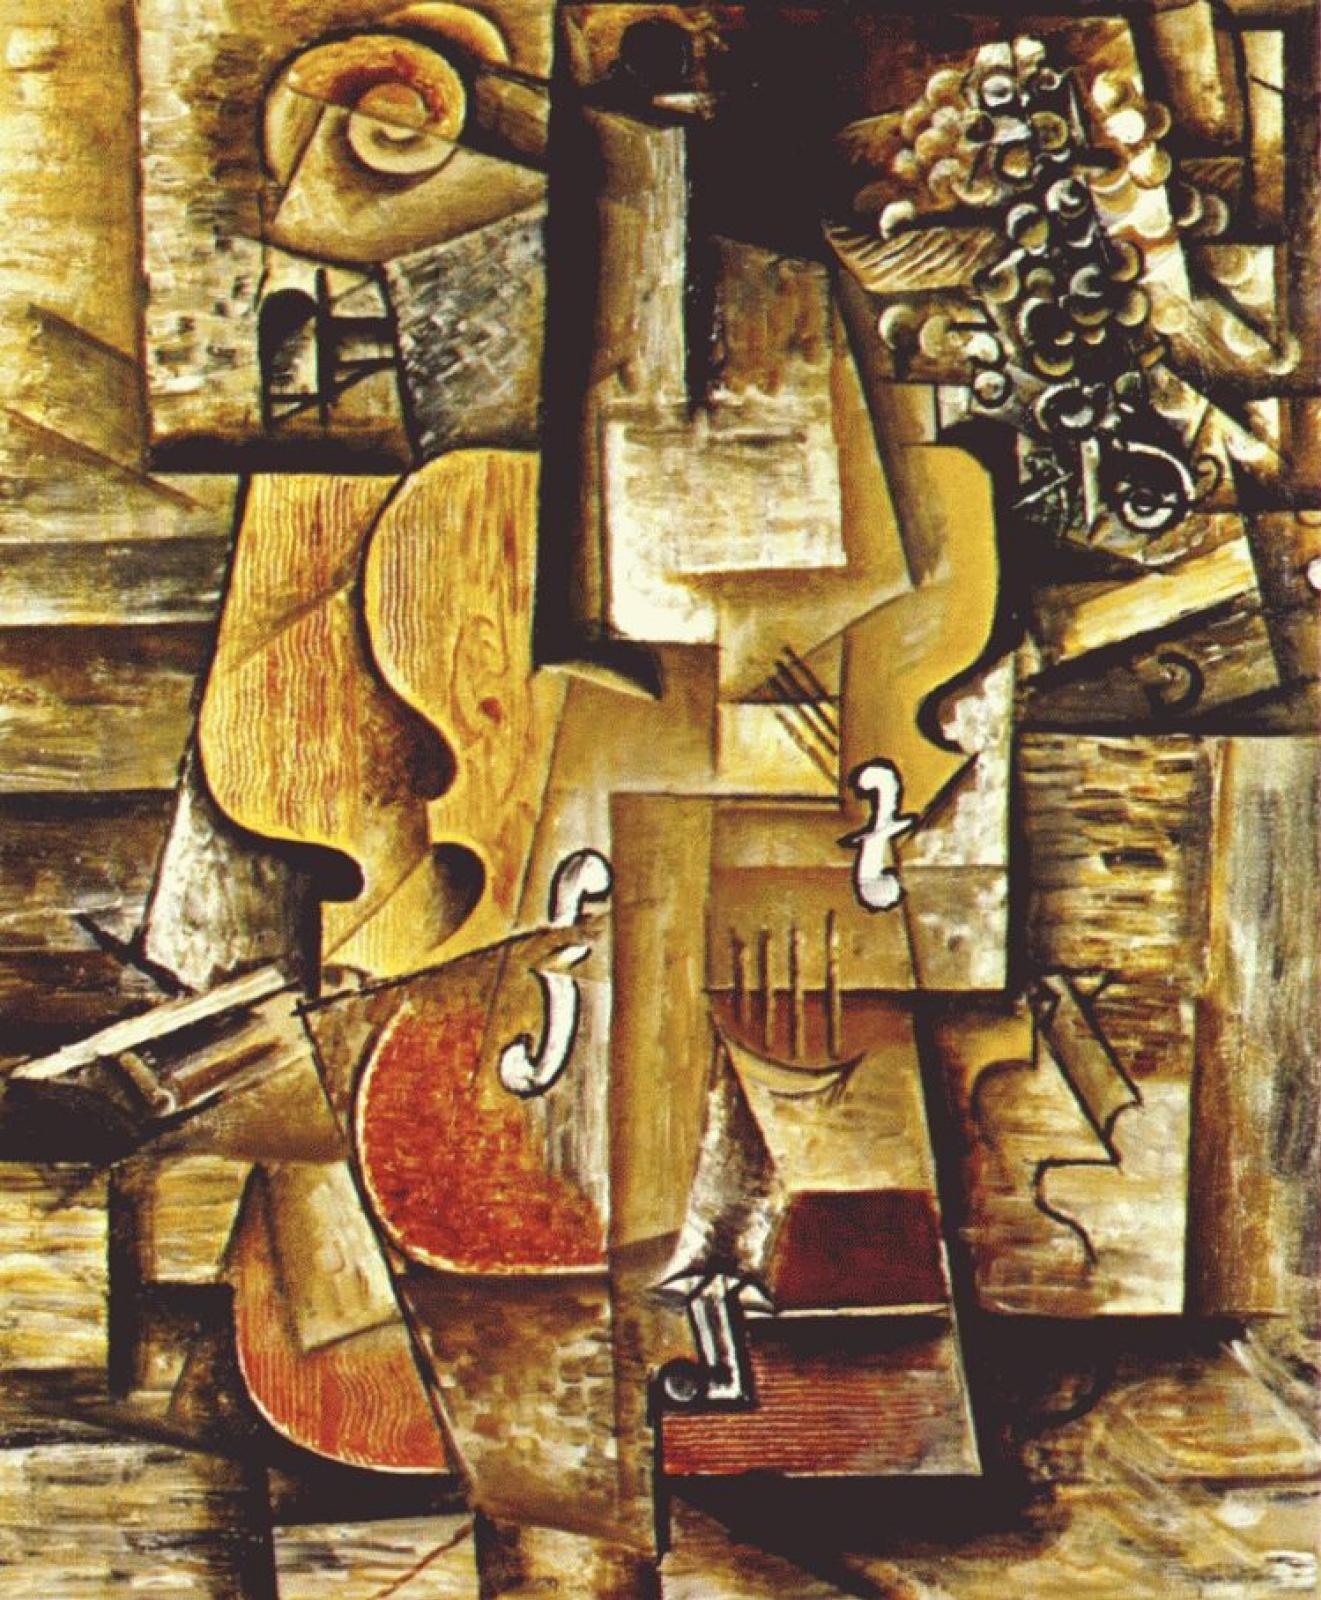 Пабло Пикассо. Скрипка и виноград